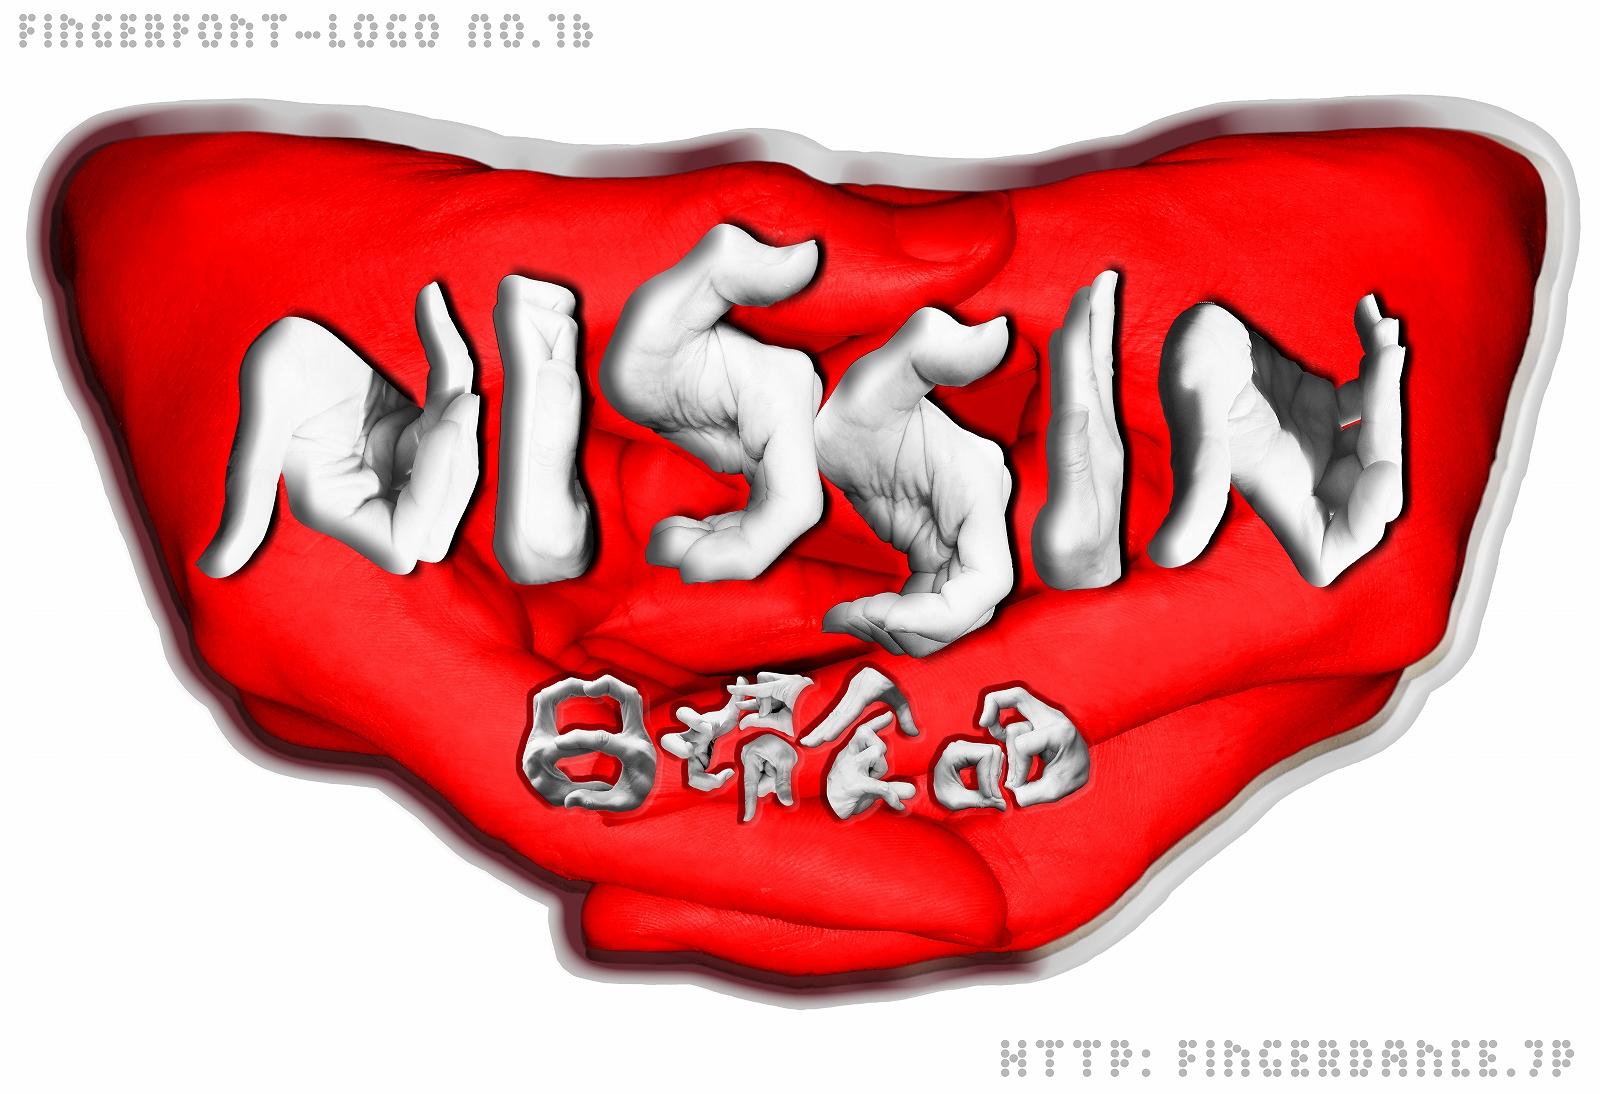 Nissin-fingerhttp://fingerdance.jp/L/logohand 日清食品・フィンガーロゴハンド手指